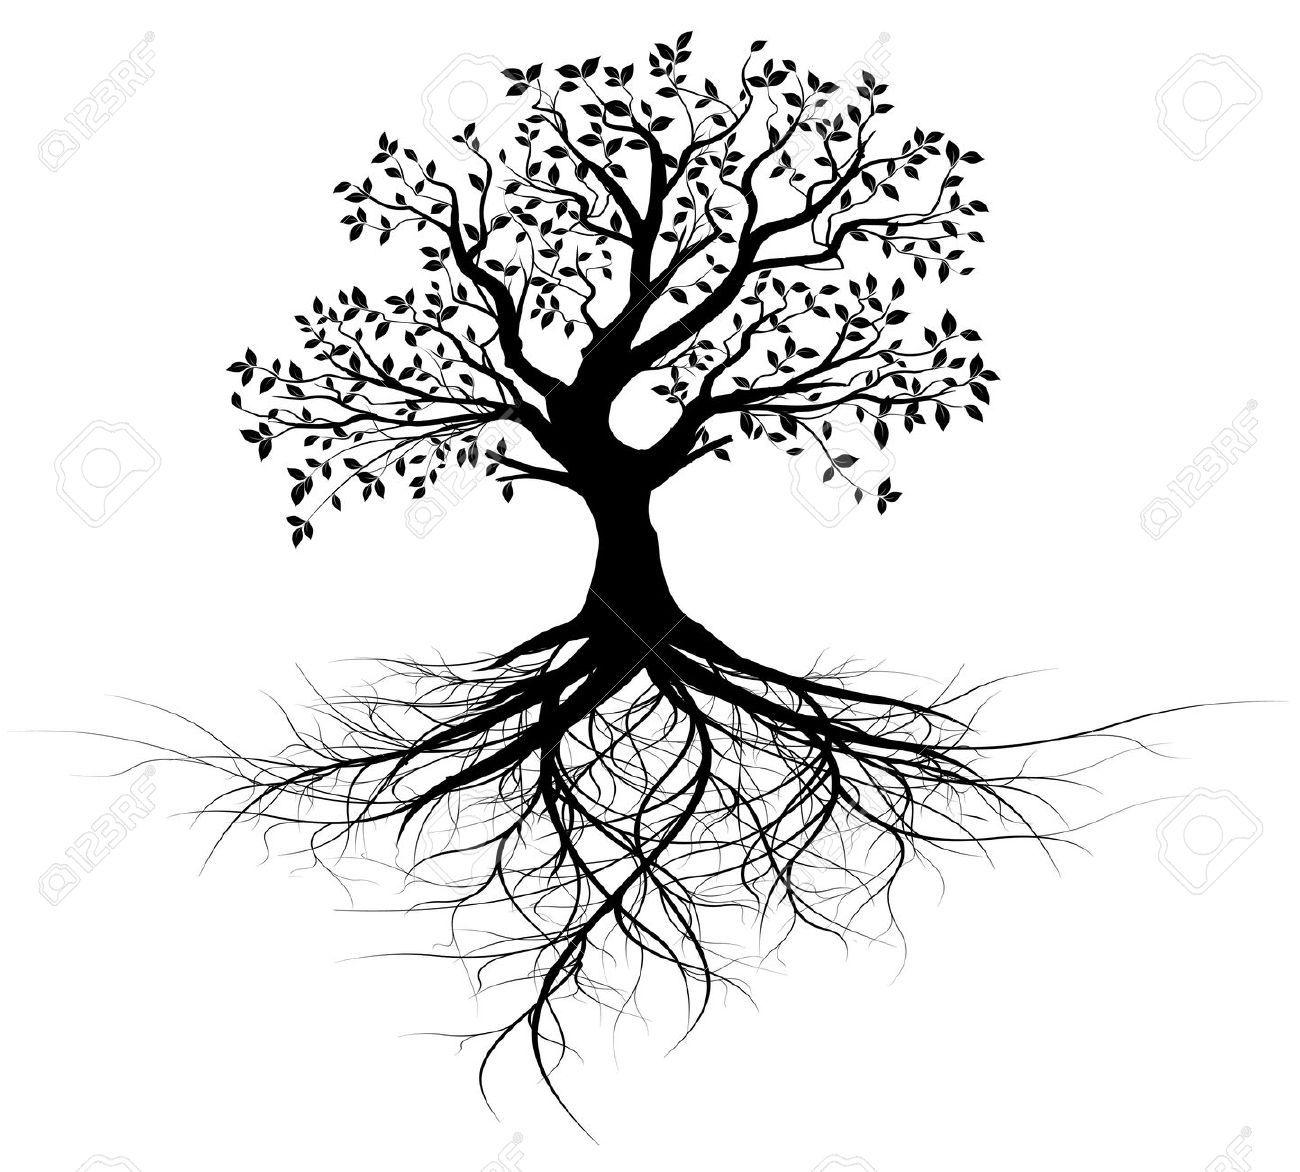 L 39 ensemble arbre noir avec des racines isol es vecteur fond blanc tatoo arbre tatouage - Arbres dessins ...